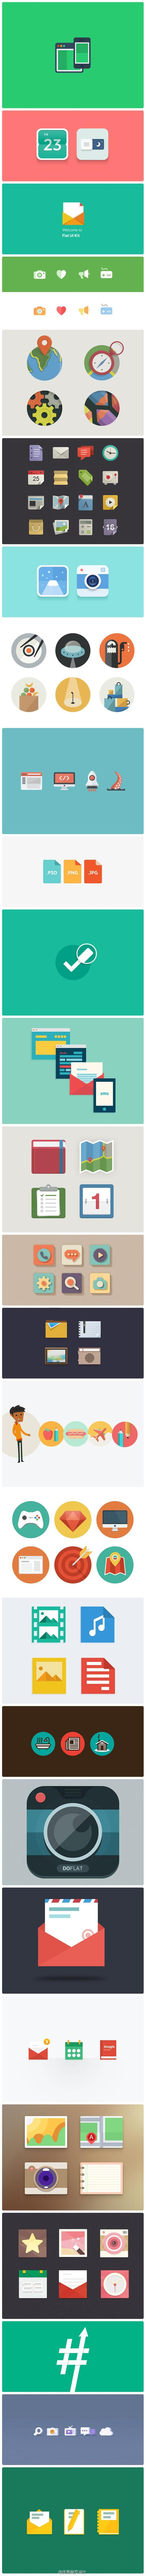 Digital   Flat Icons / #flat #icons - Flat Icons